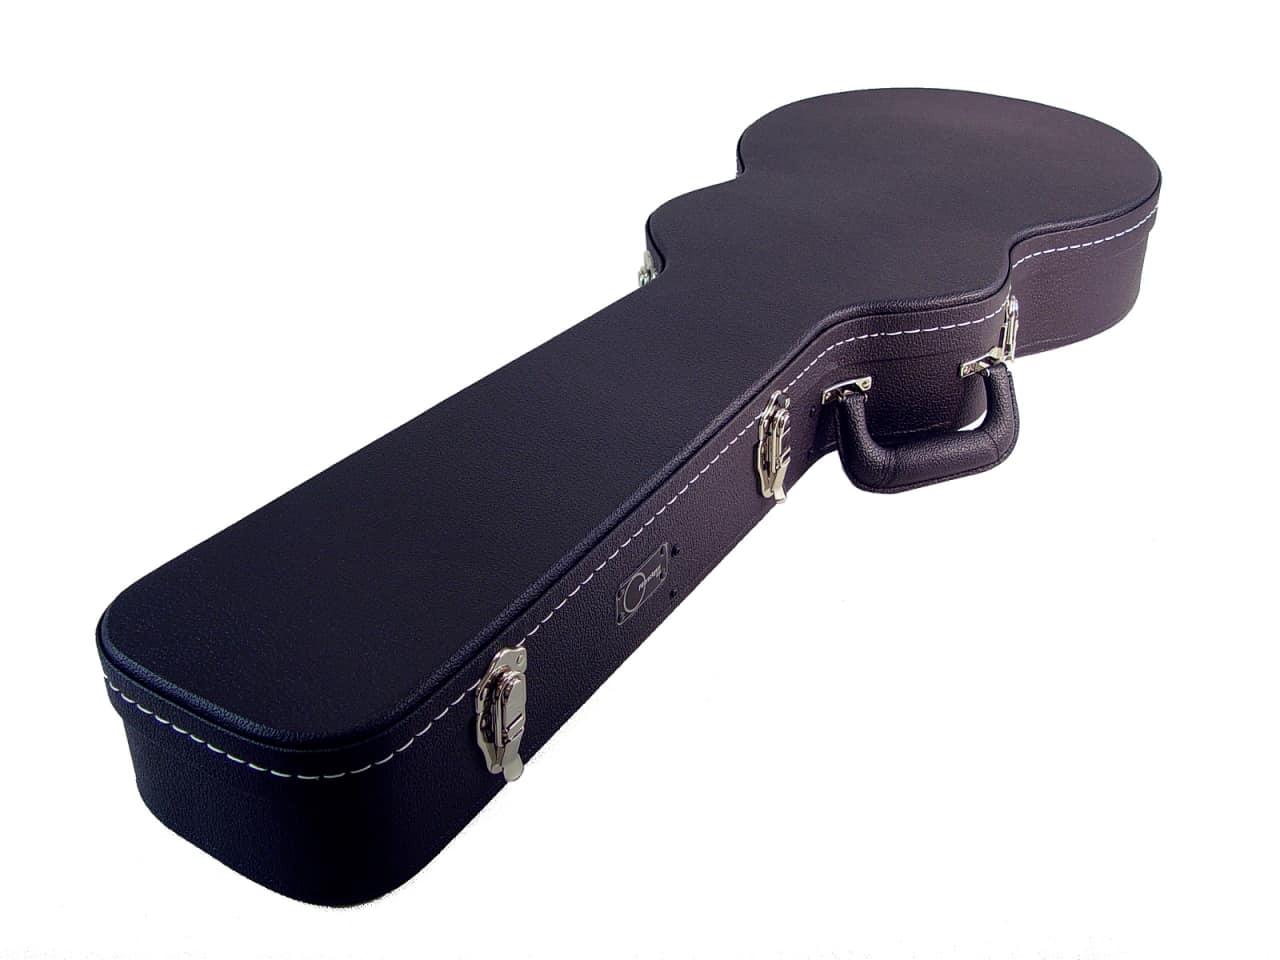 prorockgear phenom series les paul style guitar case reverb. Black Bedroom Furniture Sets. Home Design Ideas